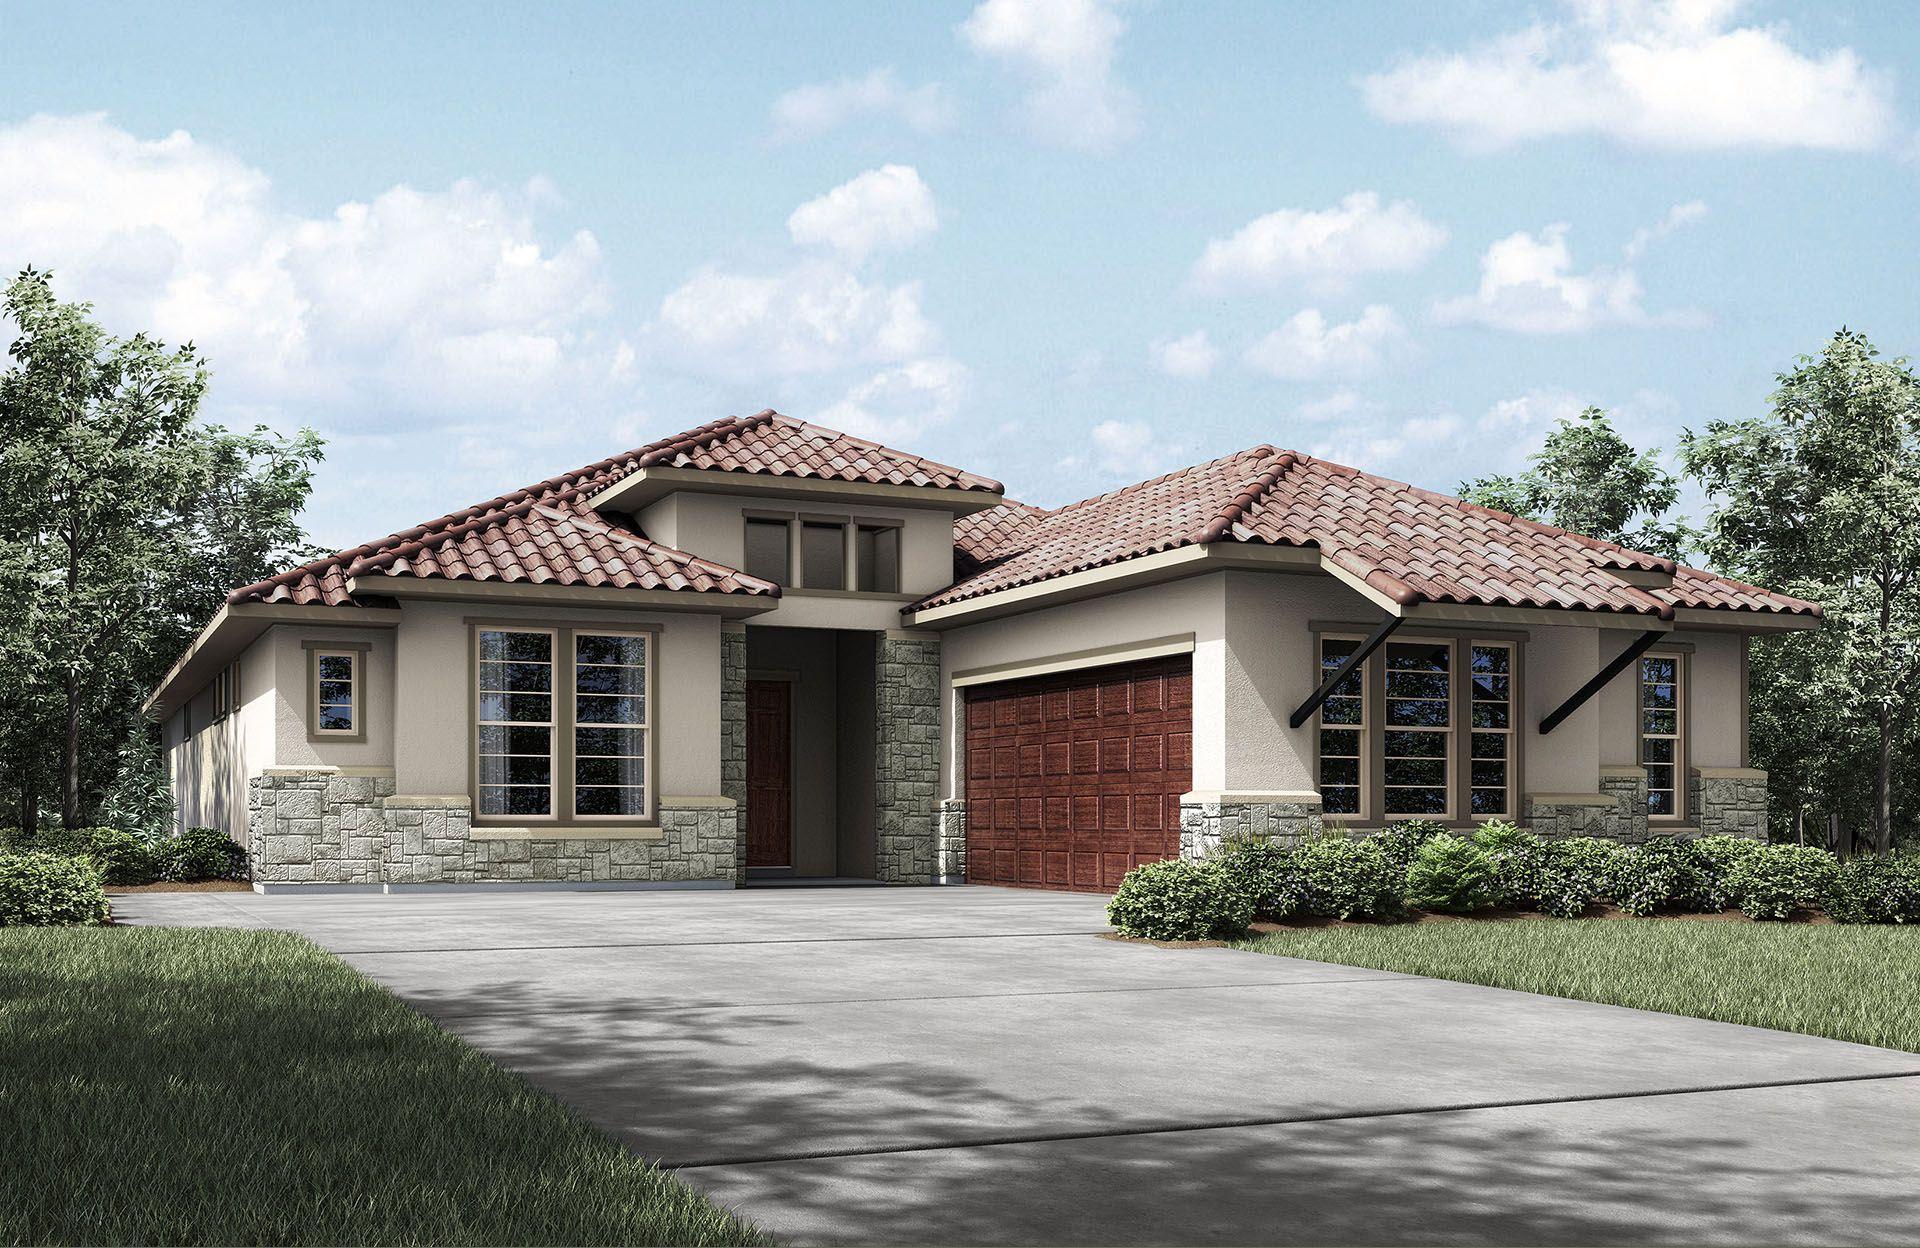 Single Family for Sale at Cimarron Hills - Kentshire 307 Flint Ridge Georgetown, Texas 78628 United States